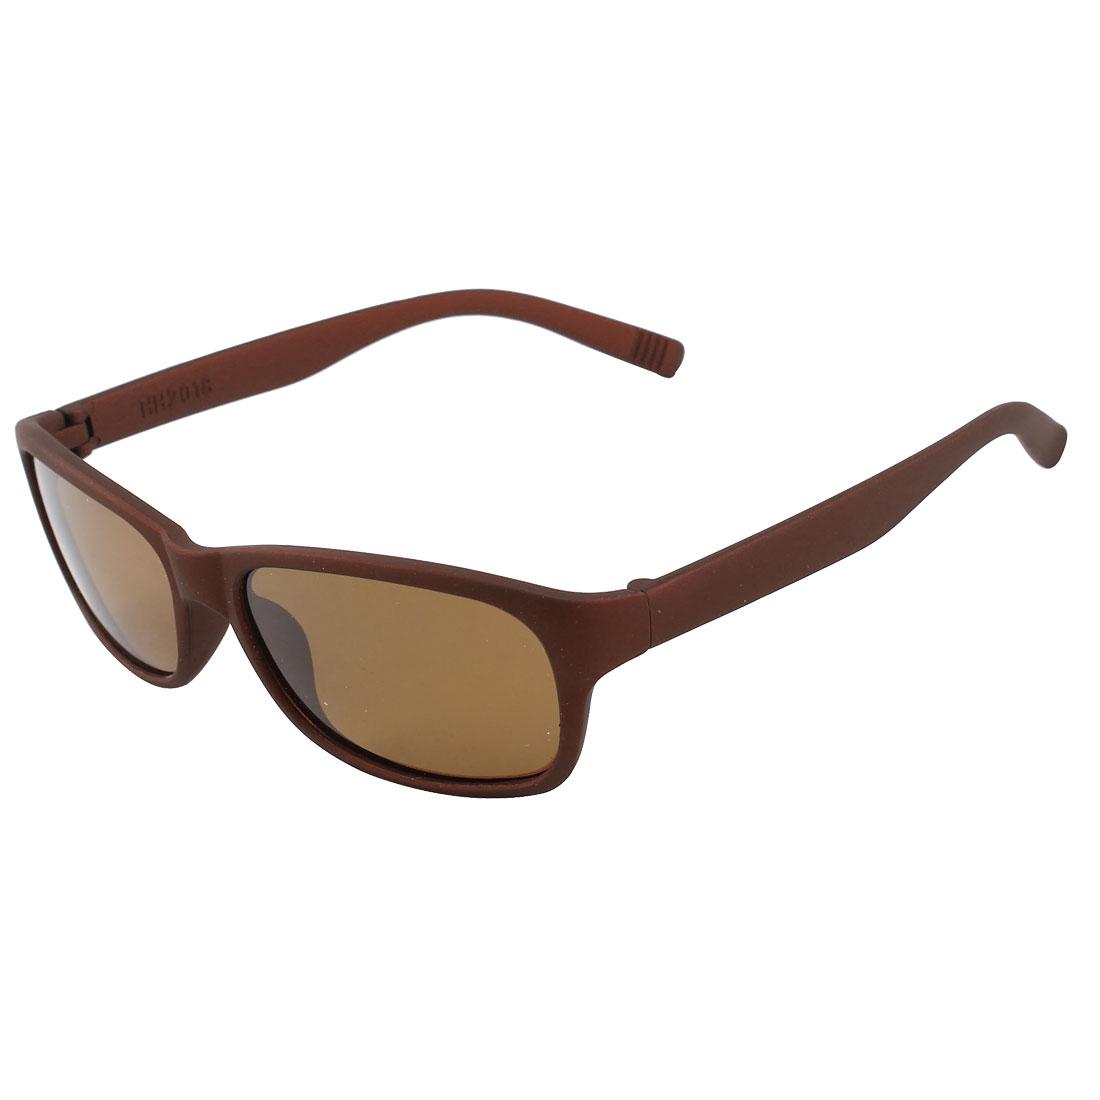 Fashional Single Brige Plastic Full Rim Frame Rectangle Shaped Lens Sports Riding Outdoor Leisure Polarized Glasses Sunglasses Brown for Man